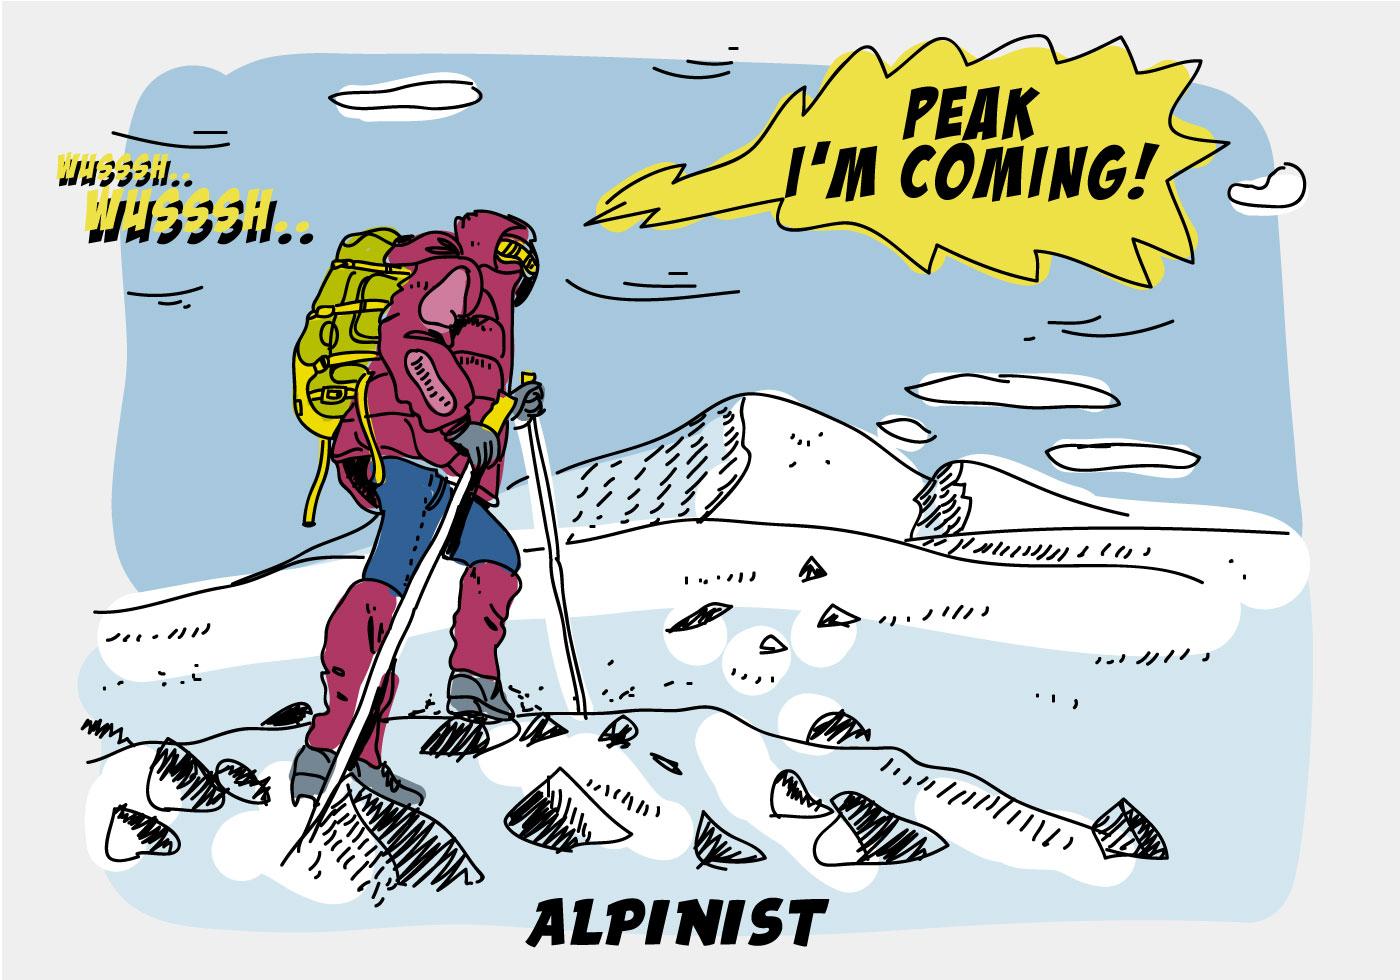 alpinist climbing peak mountain comic hand drawn vector illustration download free vector art. Black Bedroom Furniture Sets. Home Design Ideas